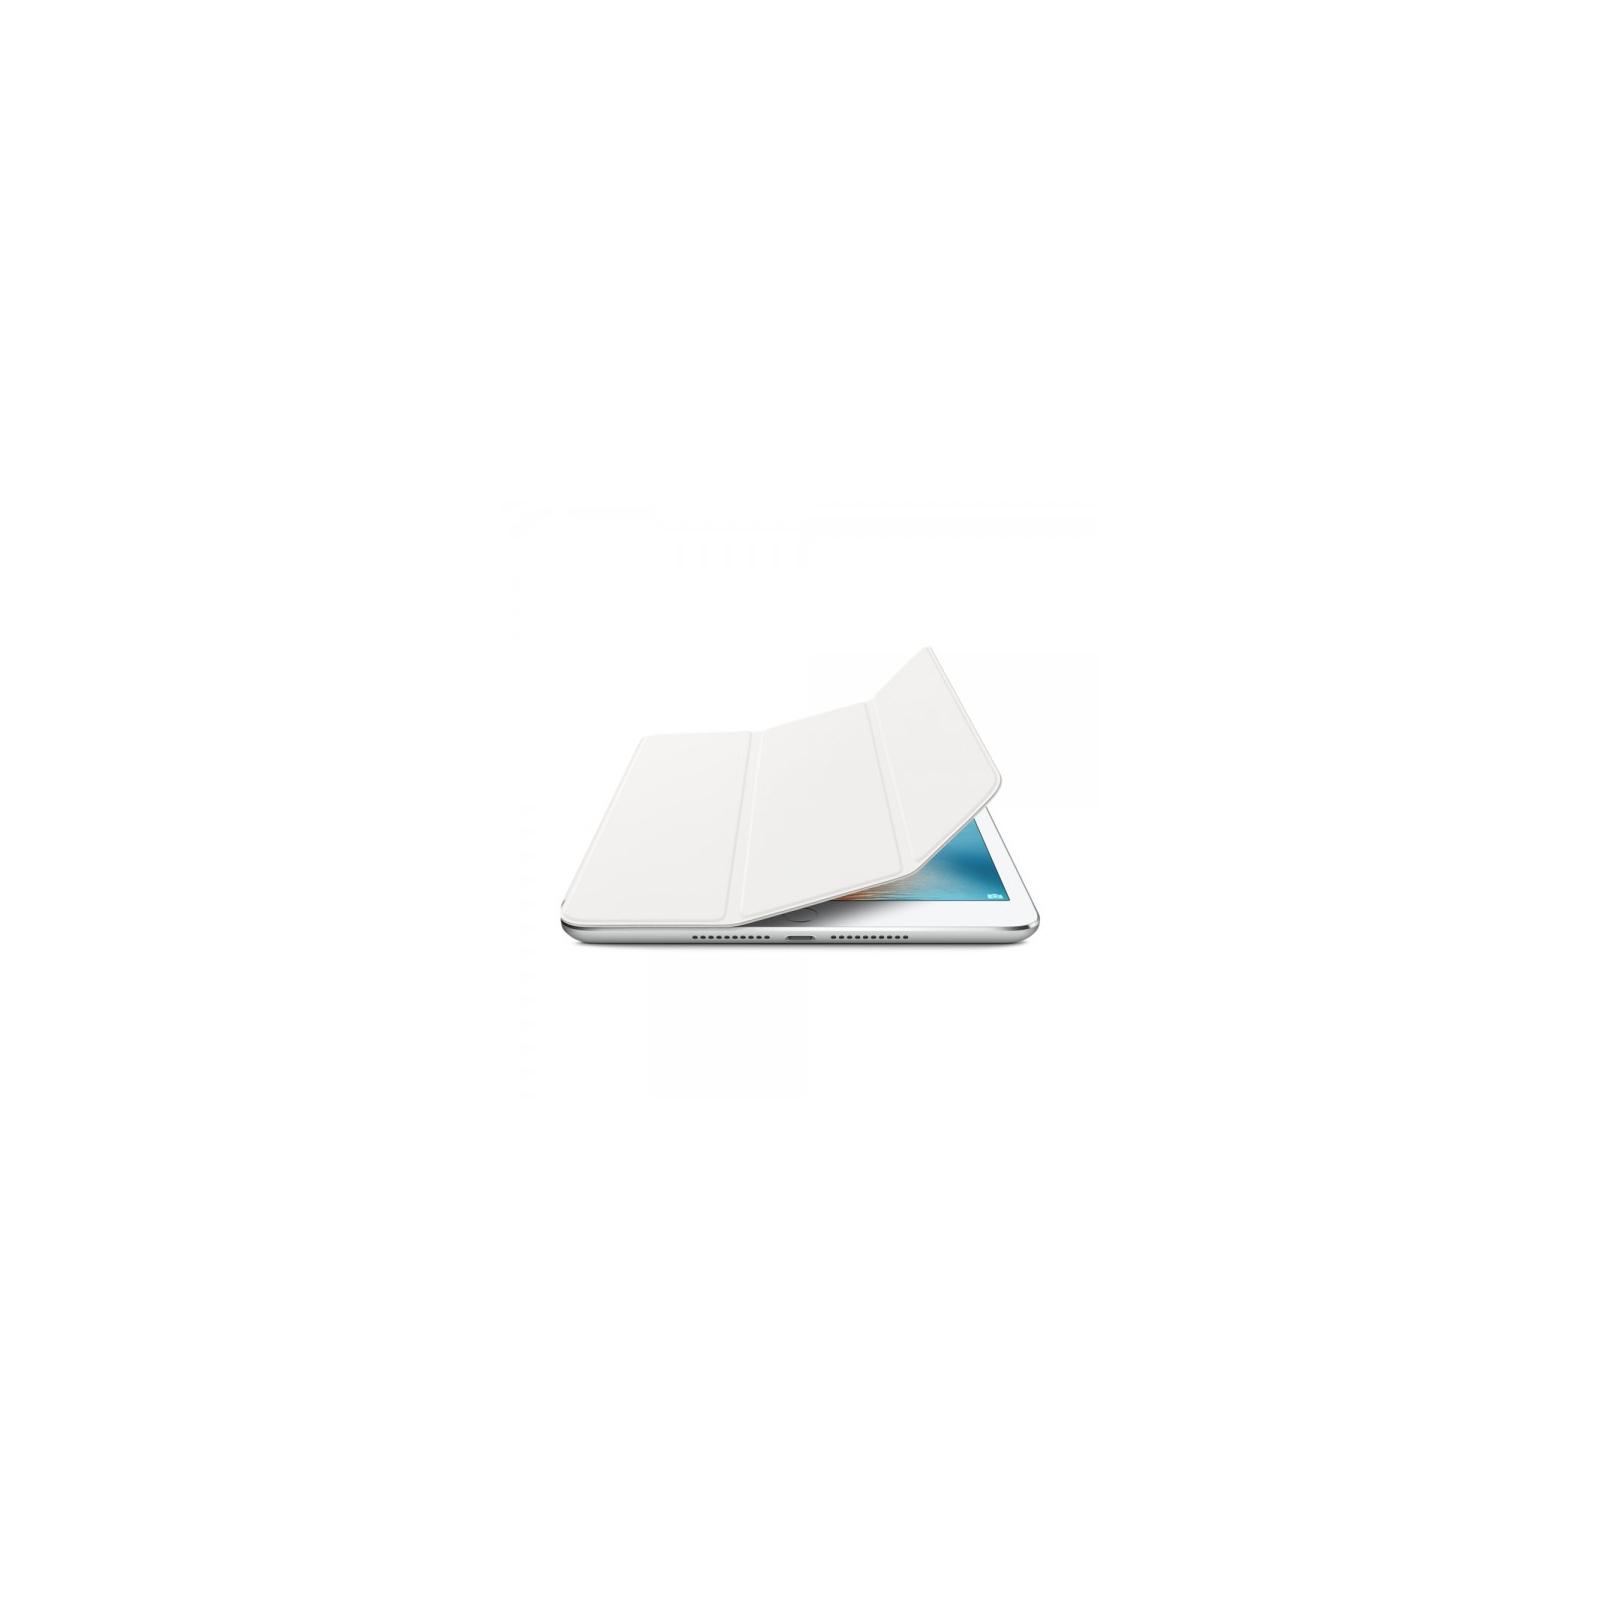 Чехол для планшета Apple Smart Cover для iPad mini 4 White (MKLW2ZM/A) изображение 3